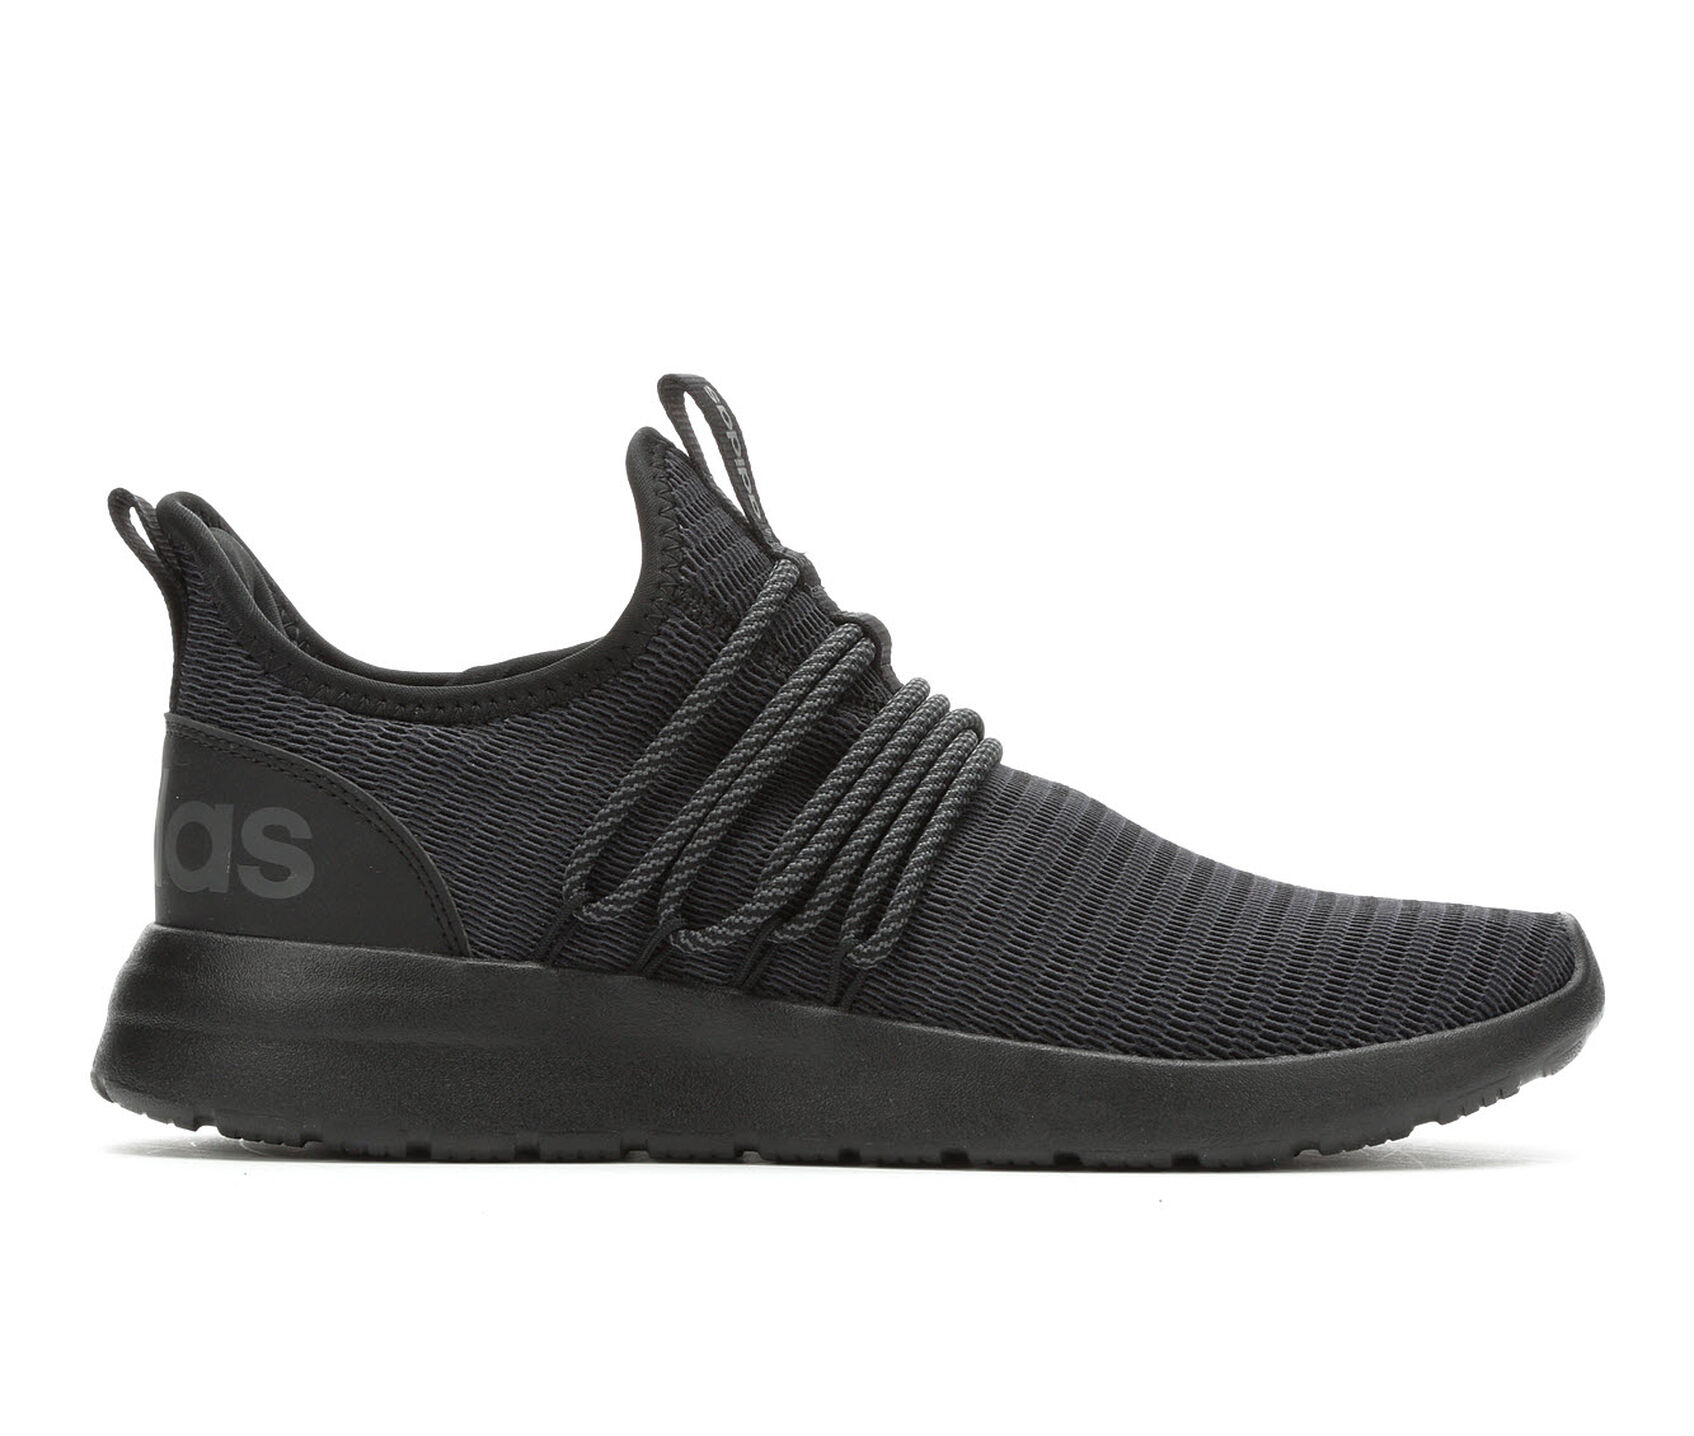 a30a03c799b Men's Adidas Lite Racer Adapt Sneakers | Shoe Carnival